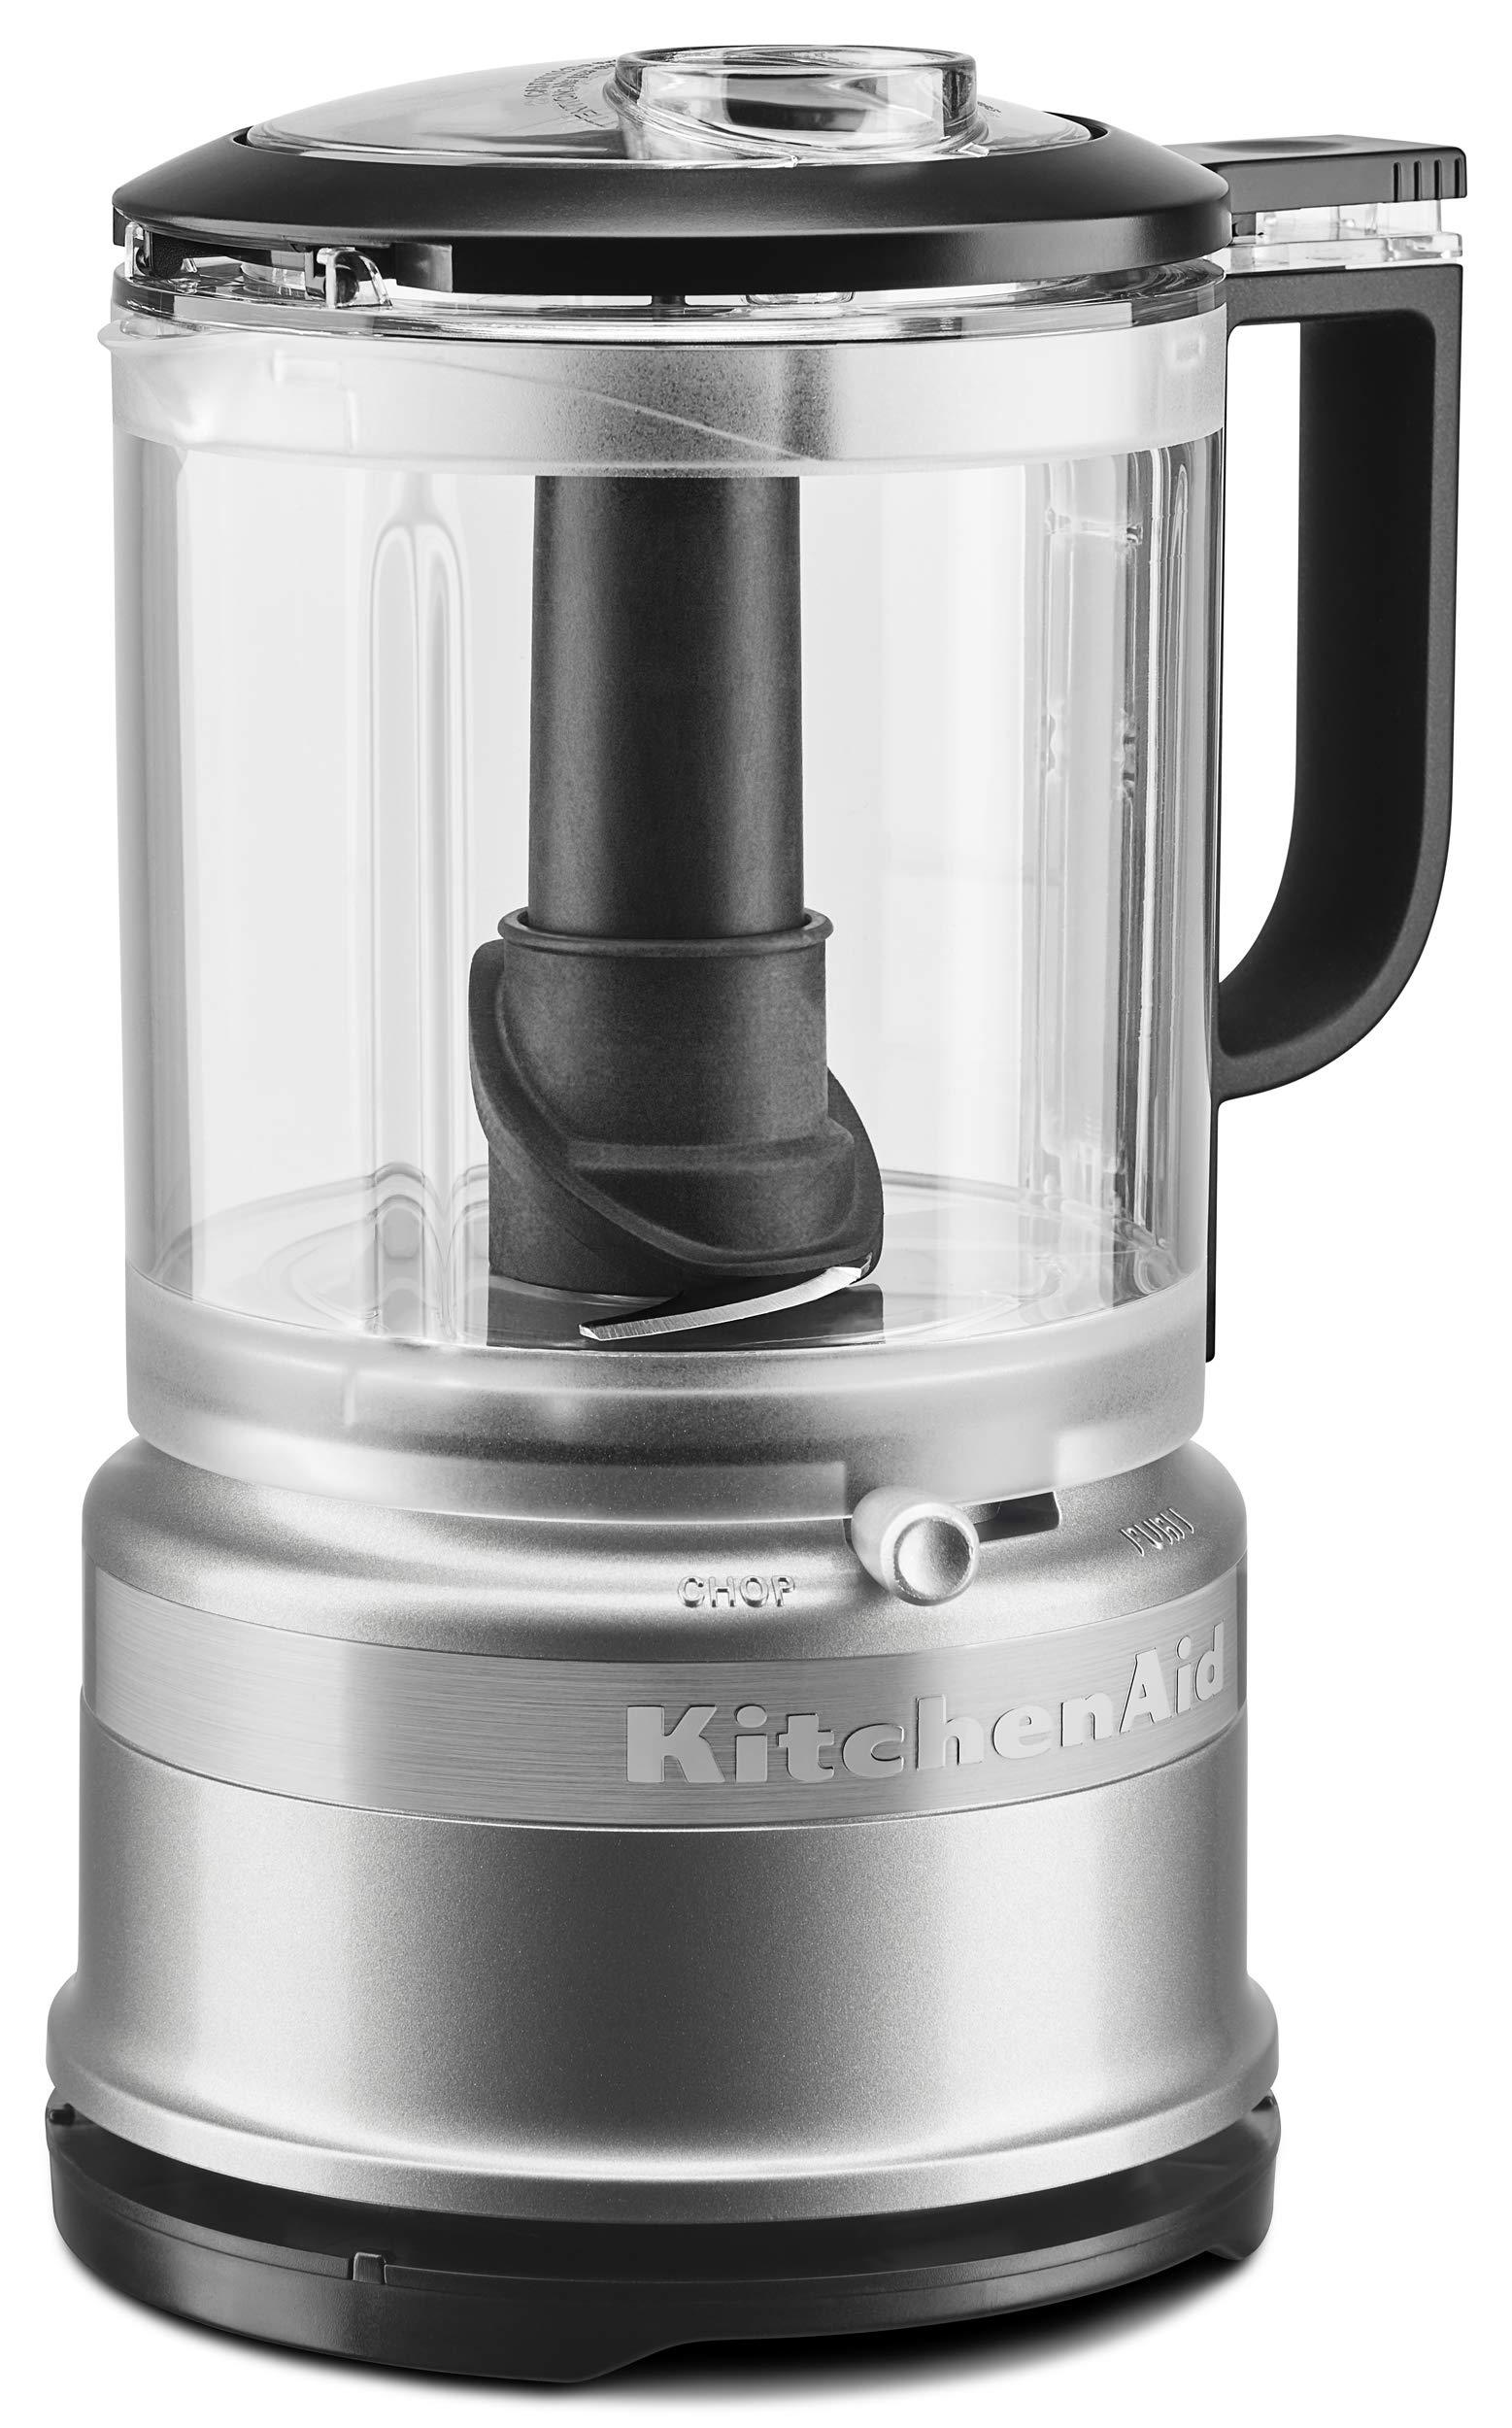 KitchenAid KFC0516CU 5 Cup Whisking Accessory Food Chopper, Contour Silver